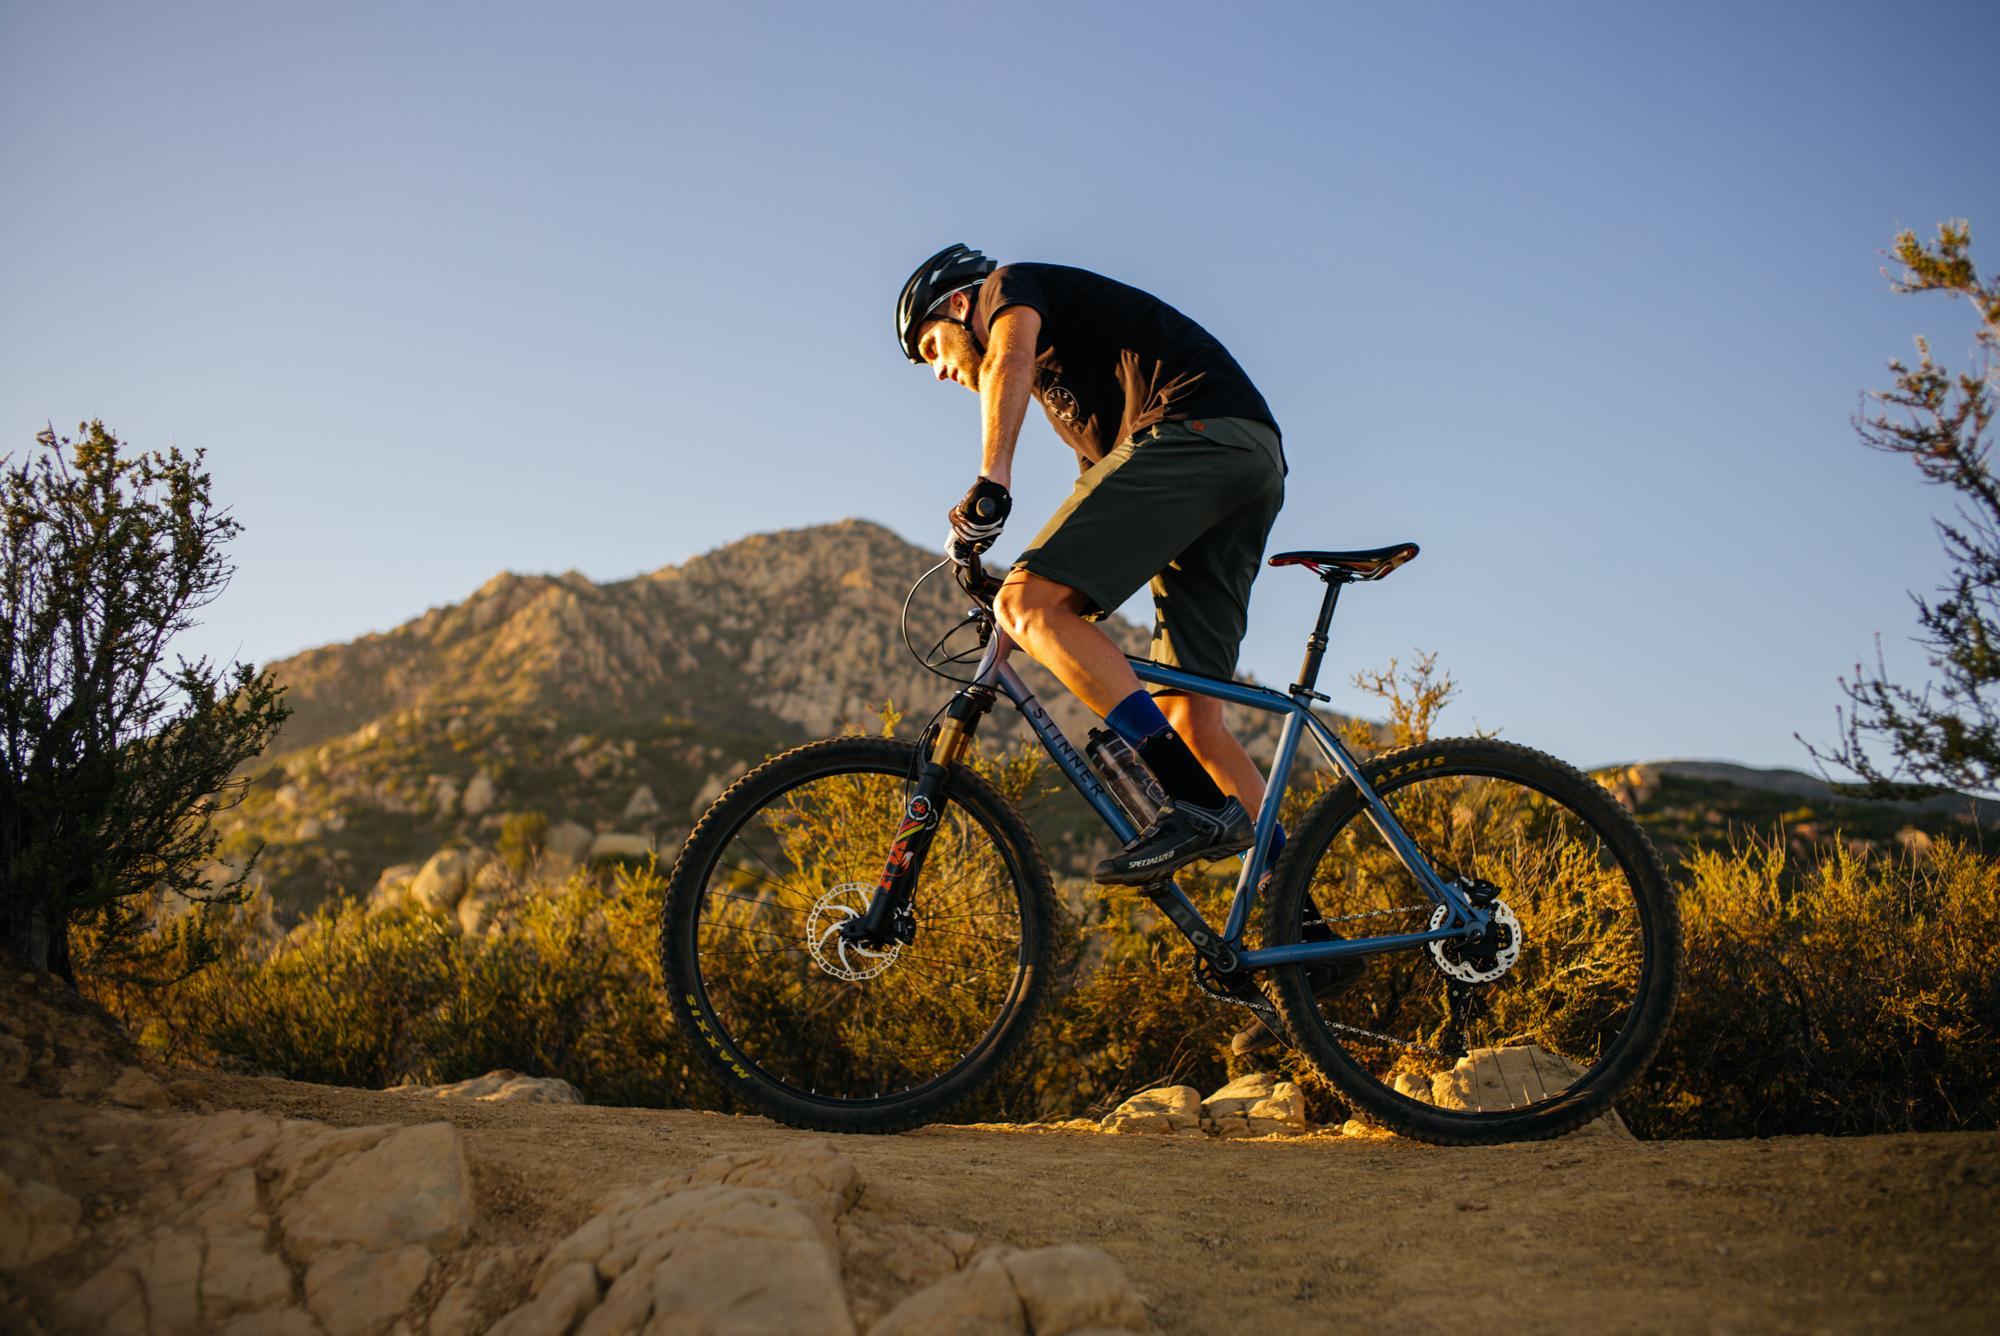 Ridge riding